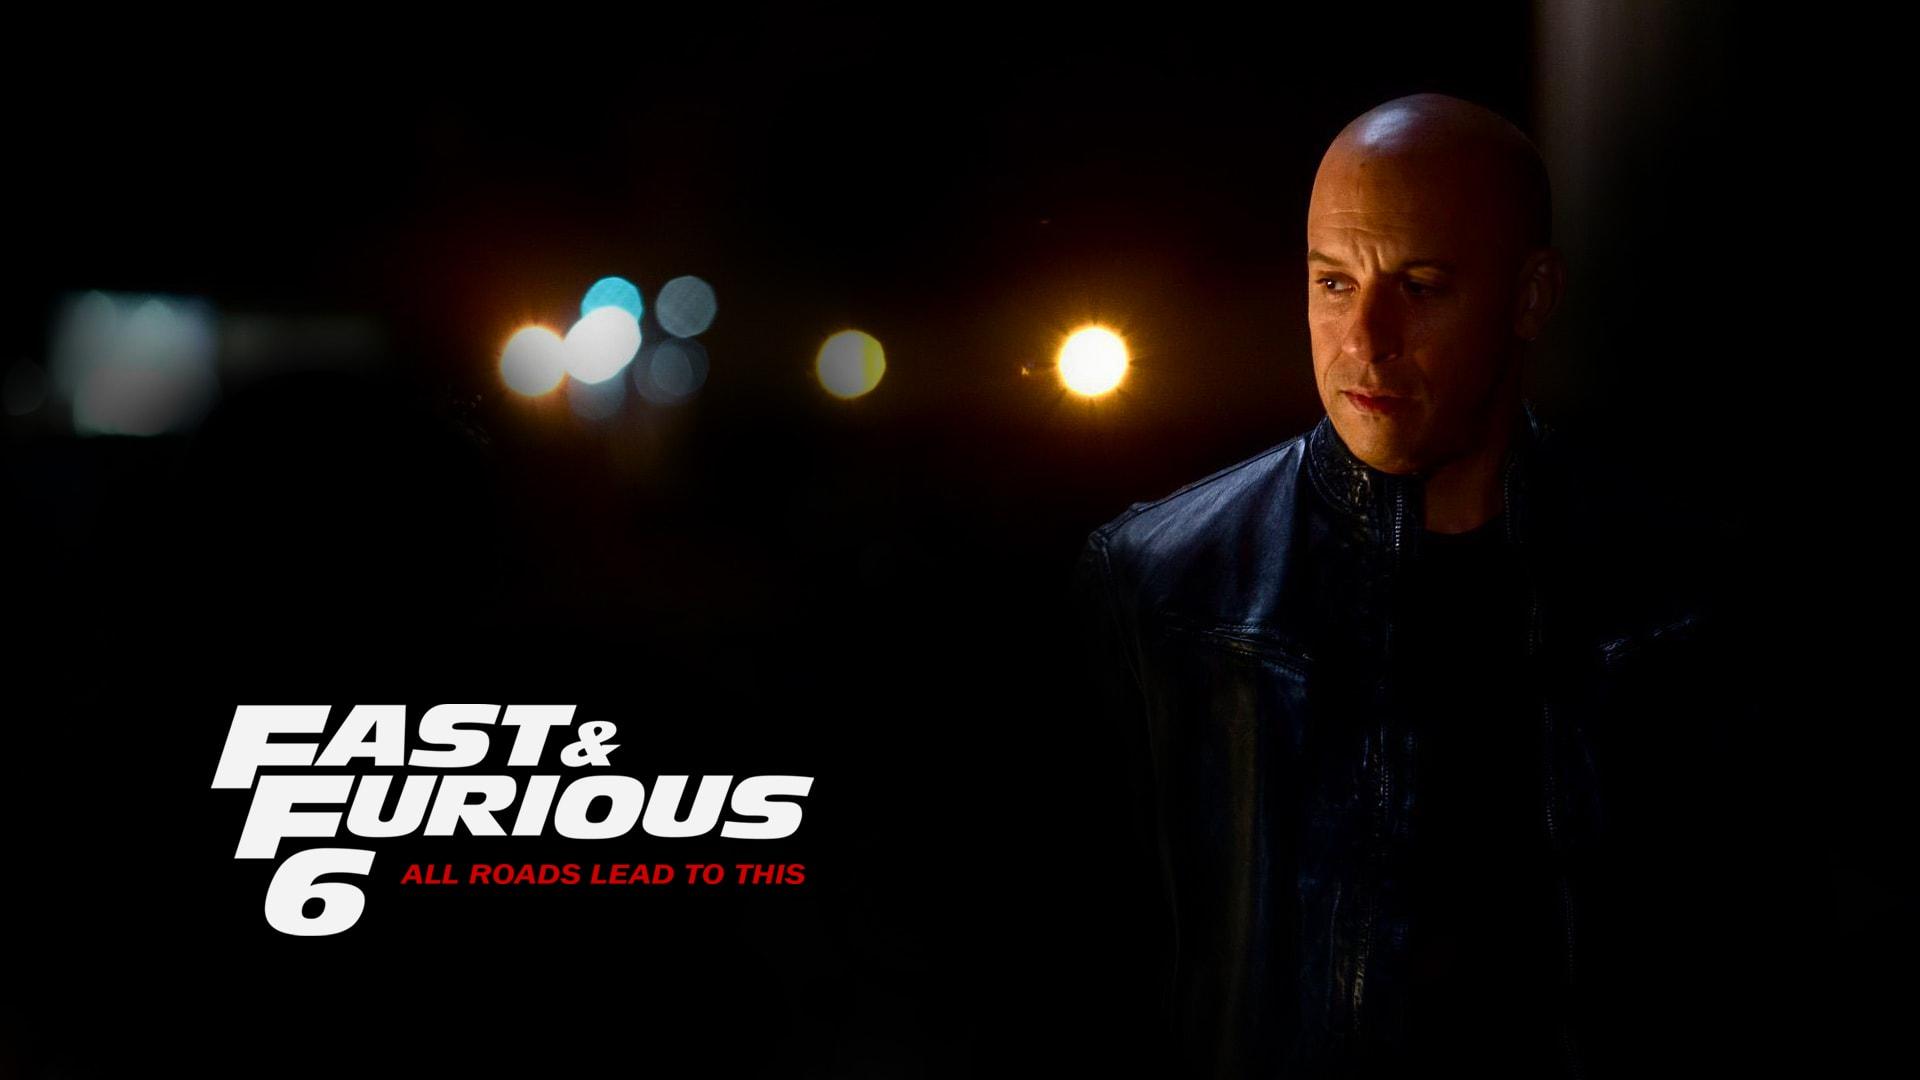 Fast & Furious 6 widescreen